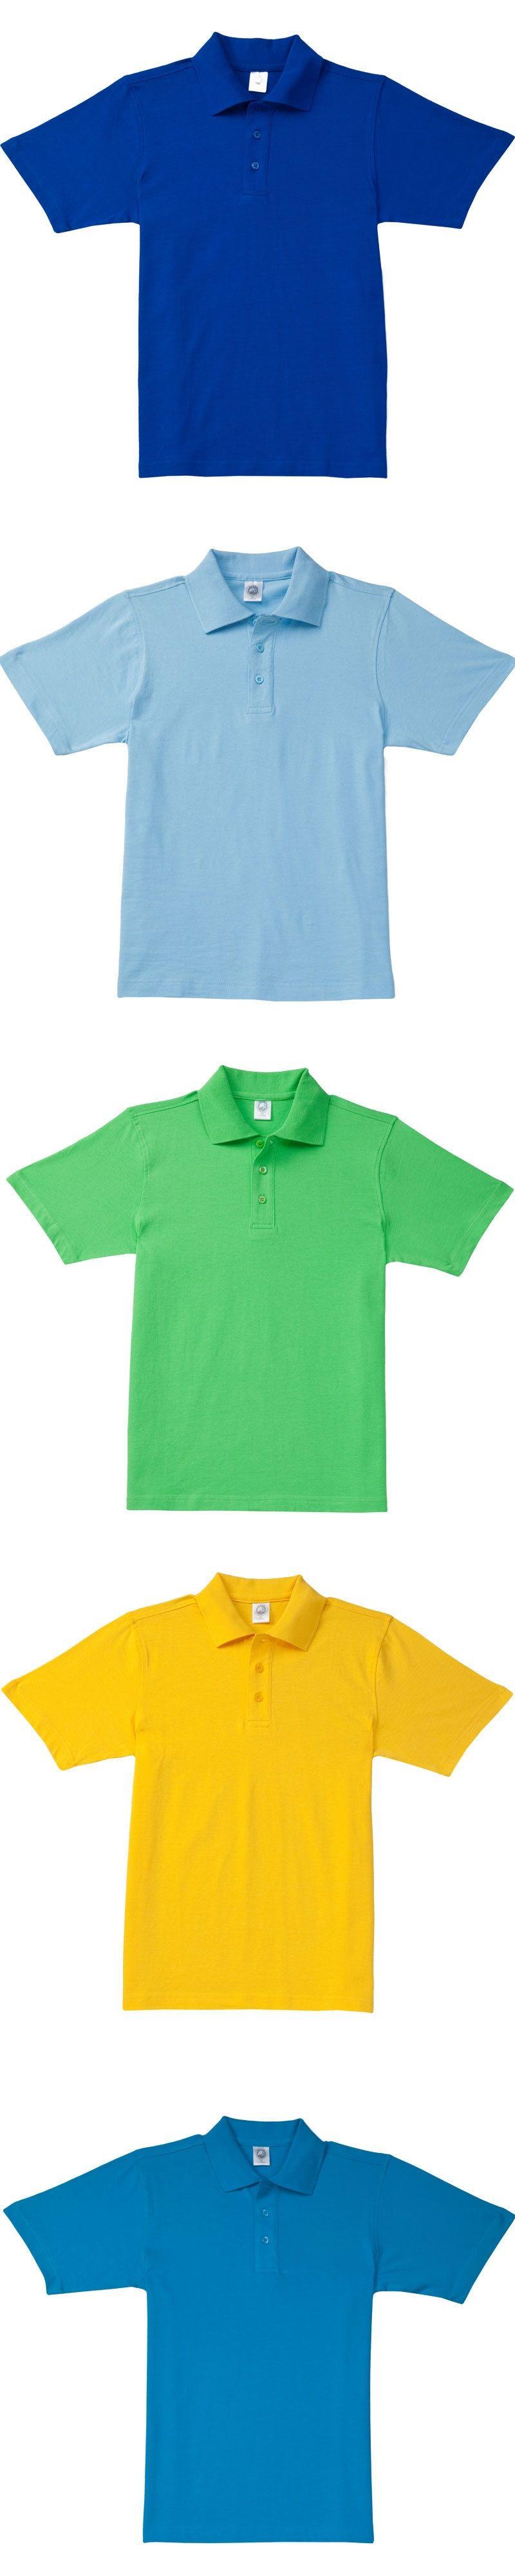 Slim Fit White T Shirt Wholesale